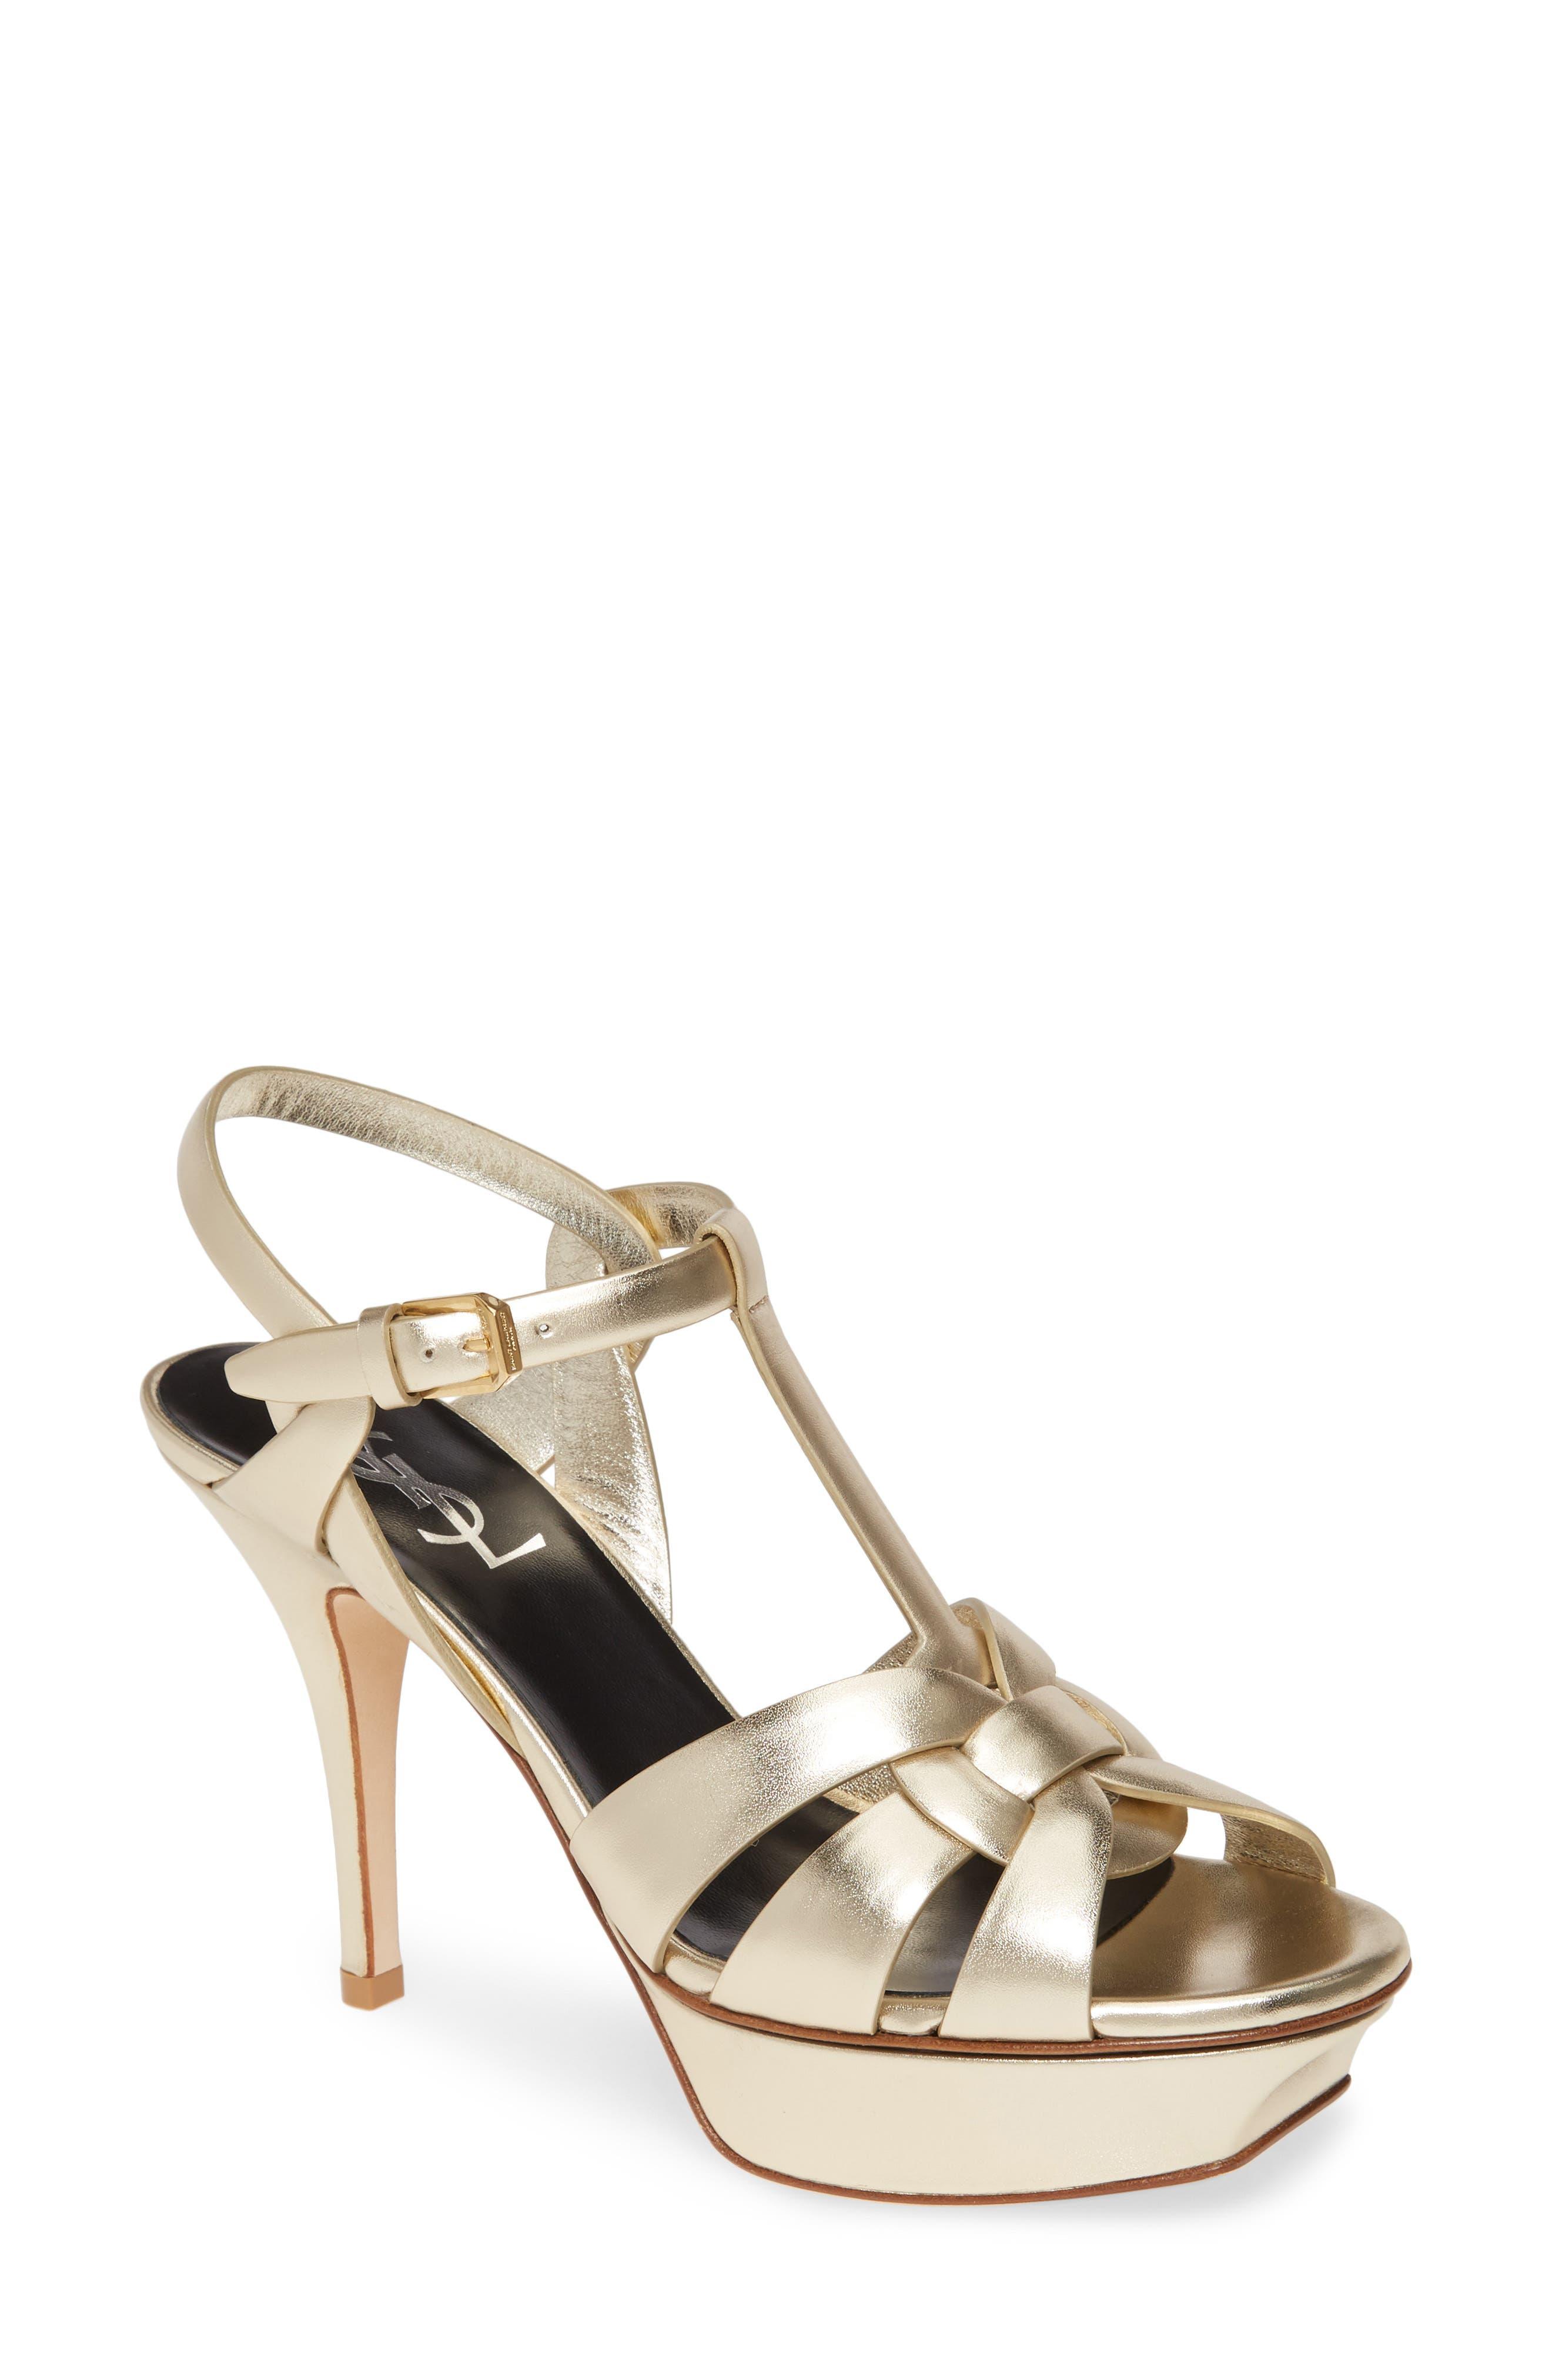 Saint Laurent Slippers Tribute Metallic Platform Sandal